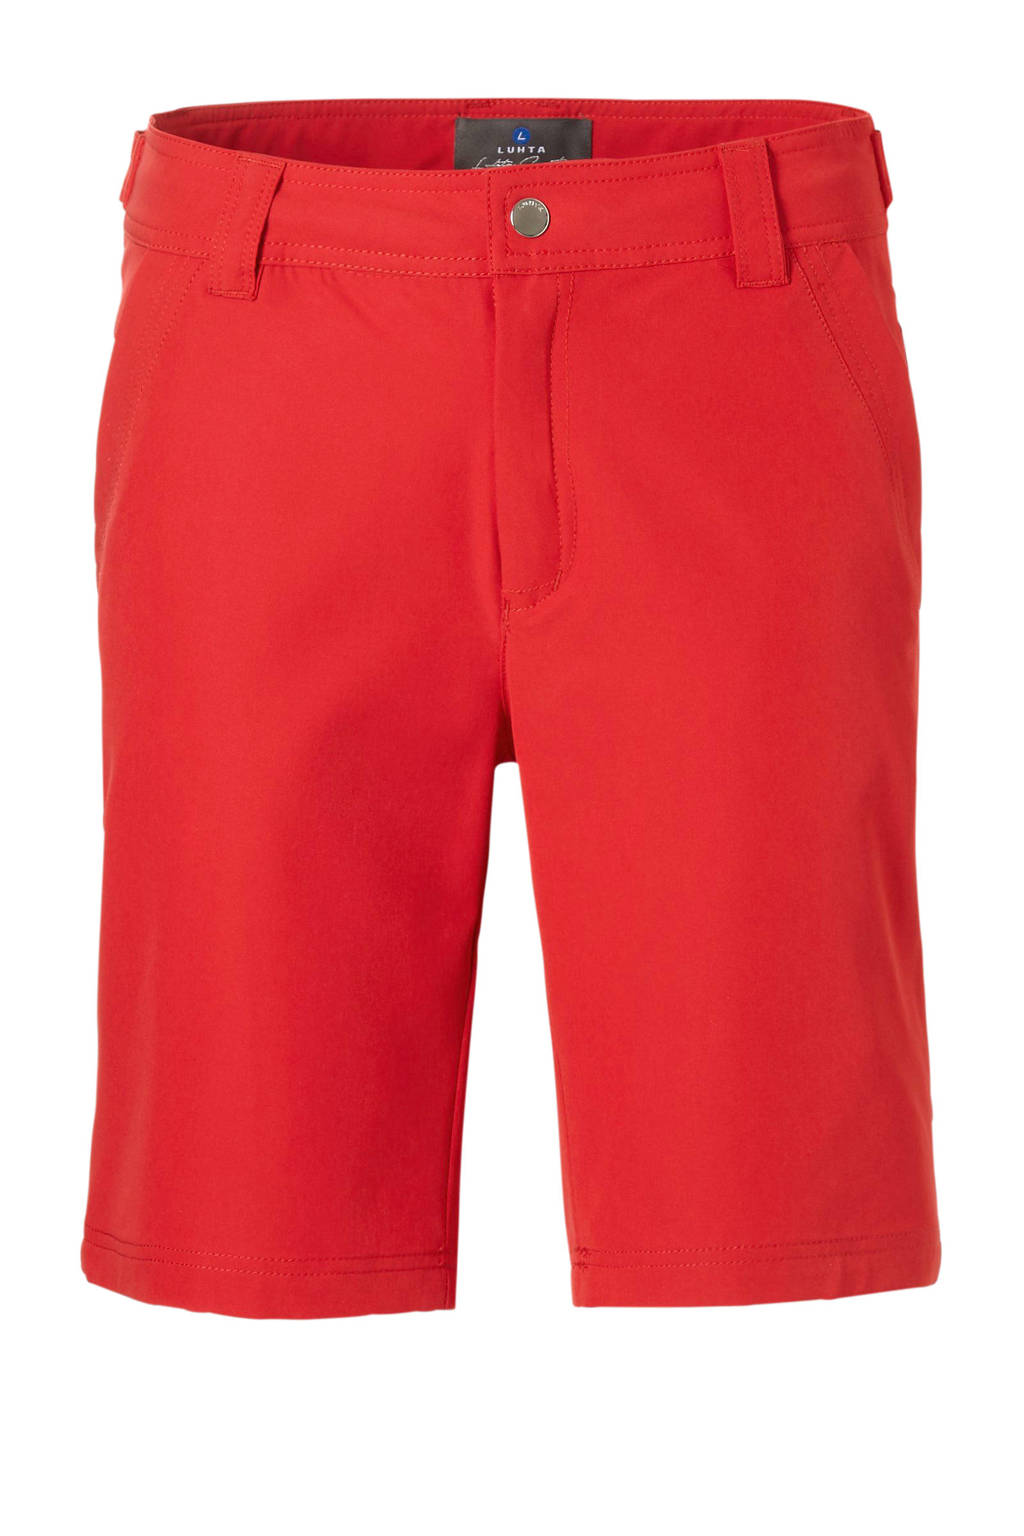 Luhta short rood, Rood